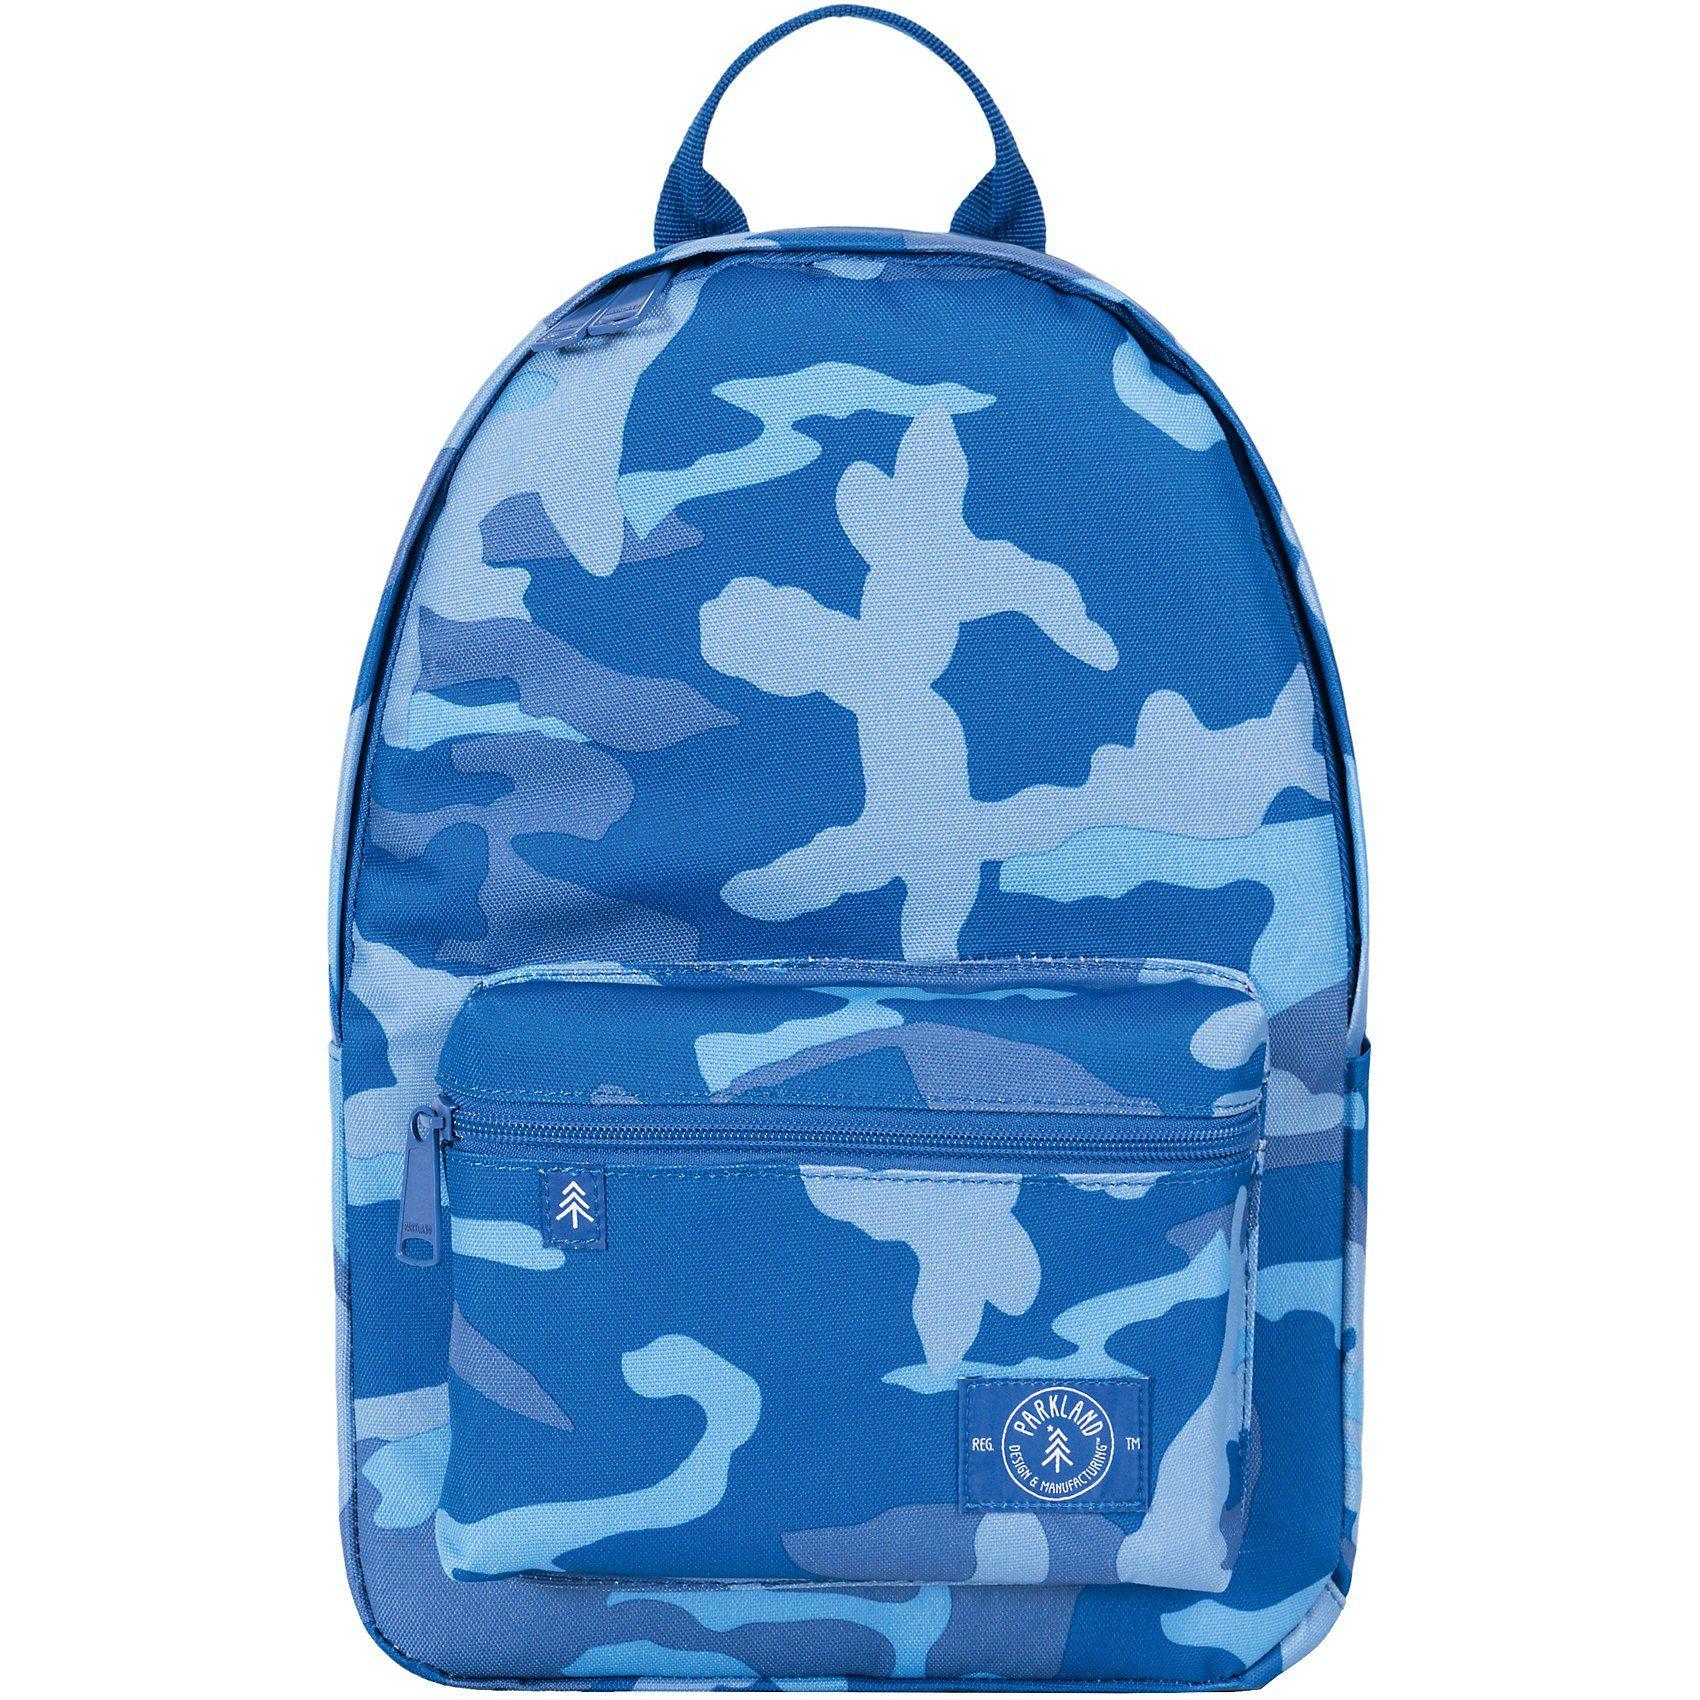 Unisex PARKLAND Kinderrucksack THE EDISON Woodland Camo Blue blau | 00828432199655